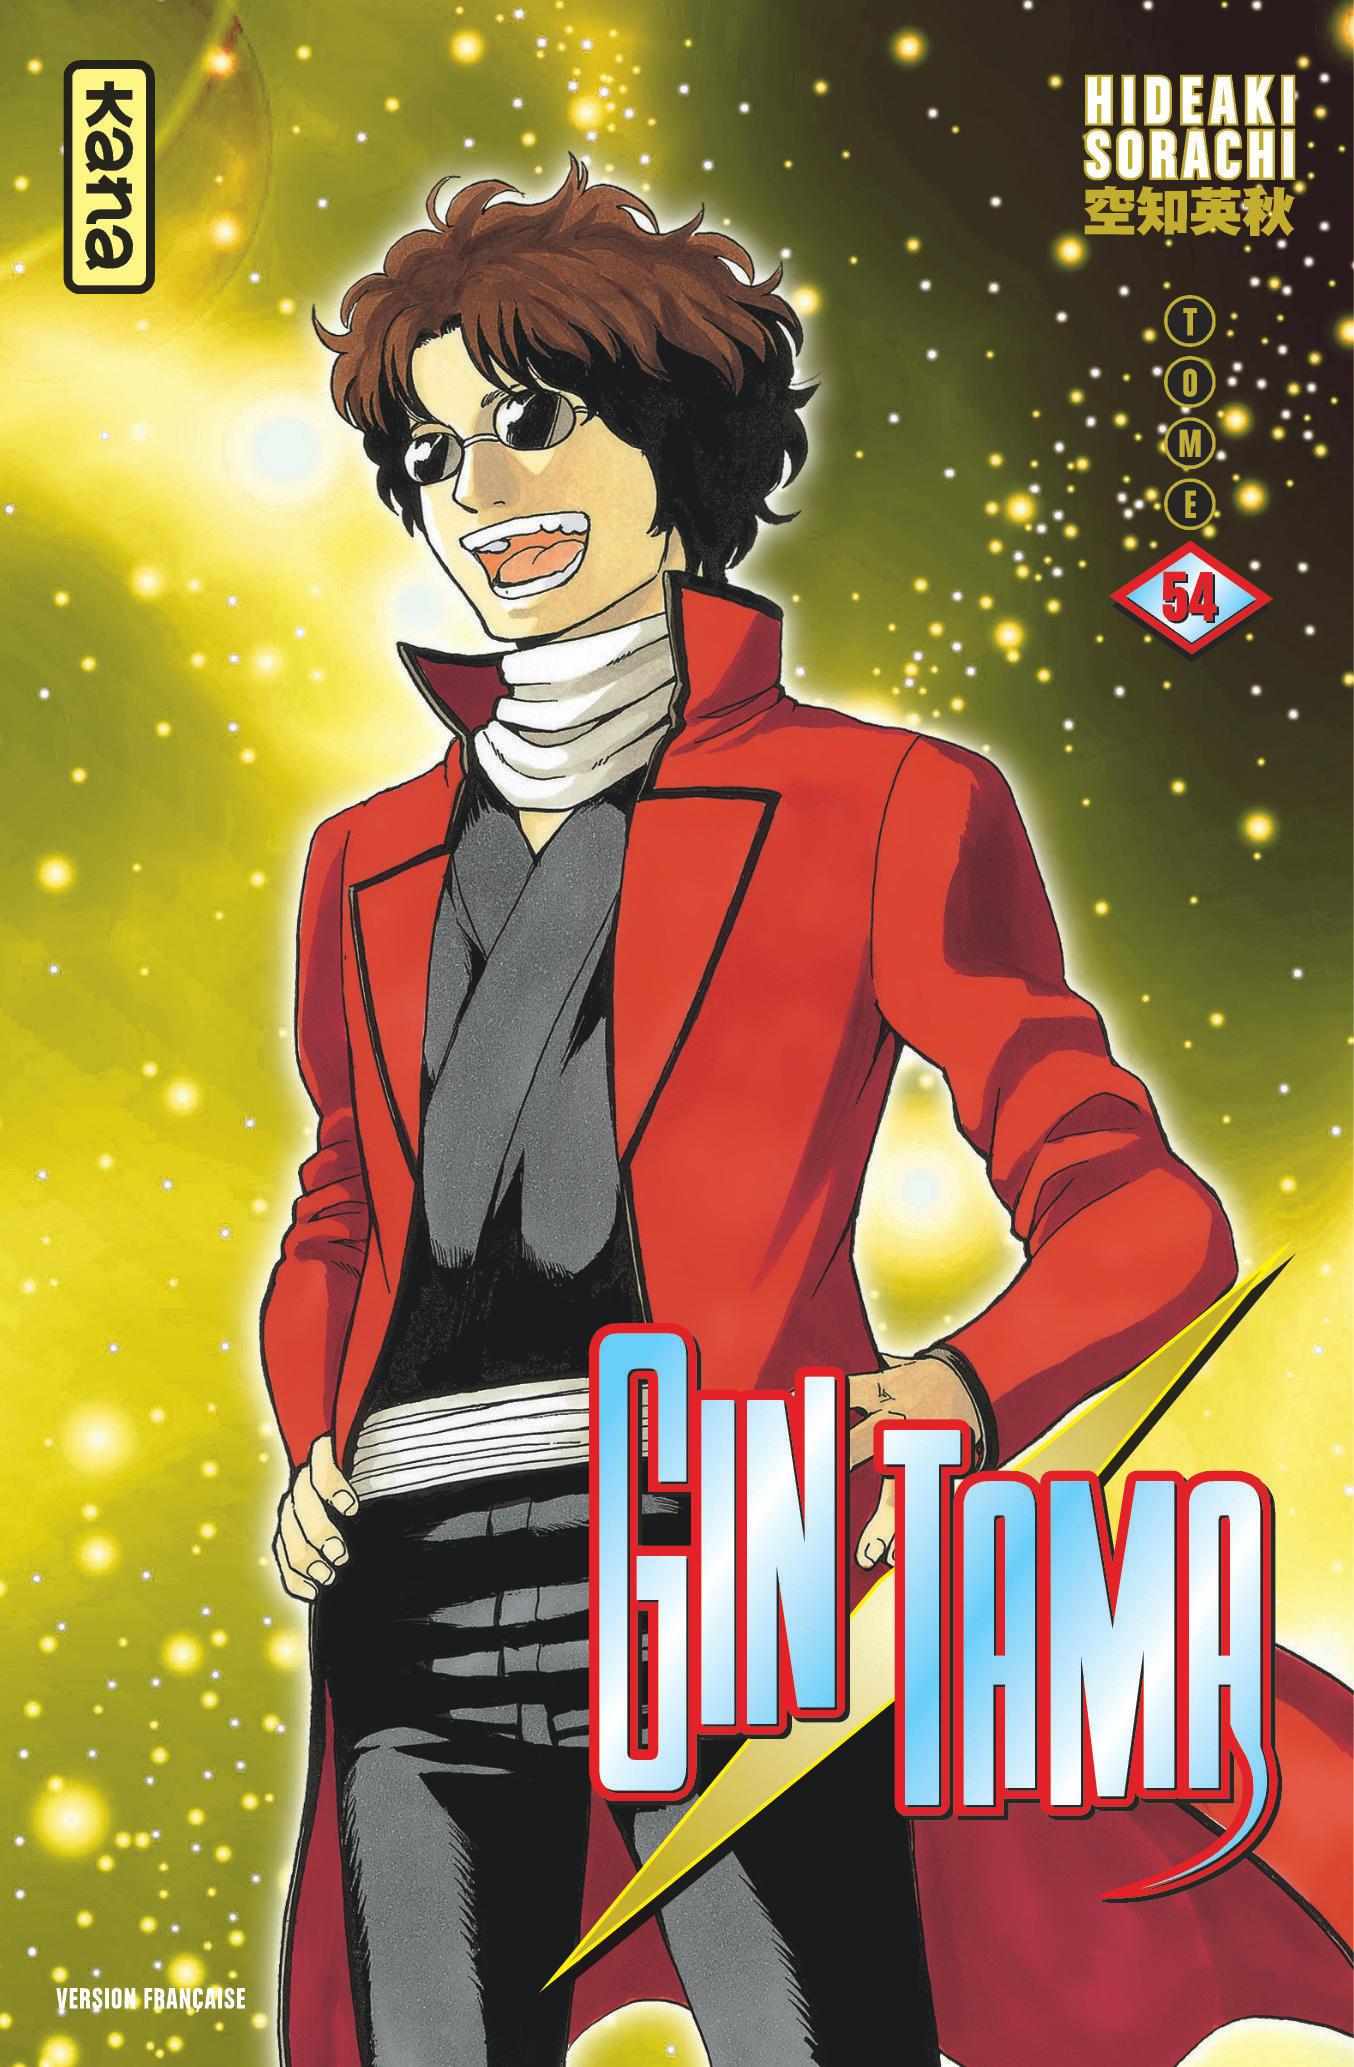 Gintama 54